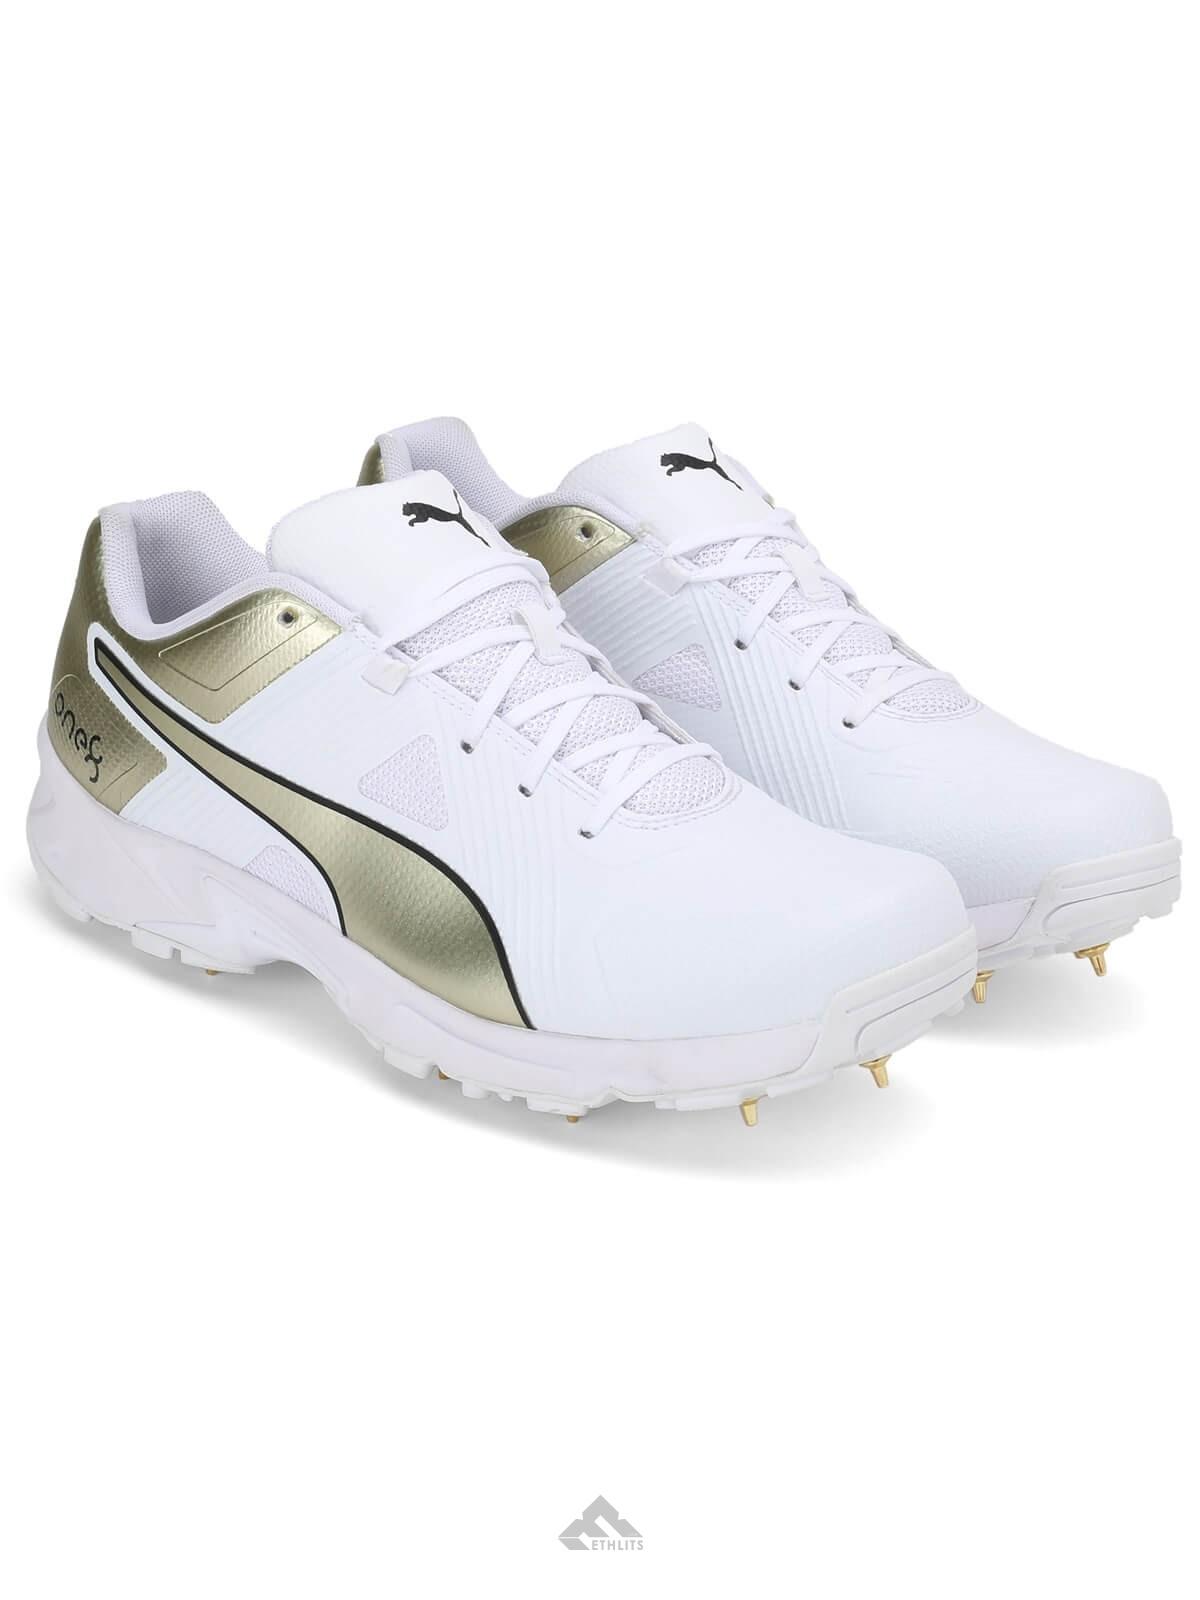 Buy Puma Virat Kohli X Spike 19 1 Gold White Collectors